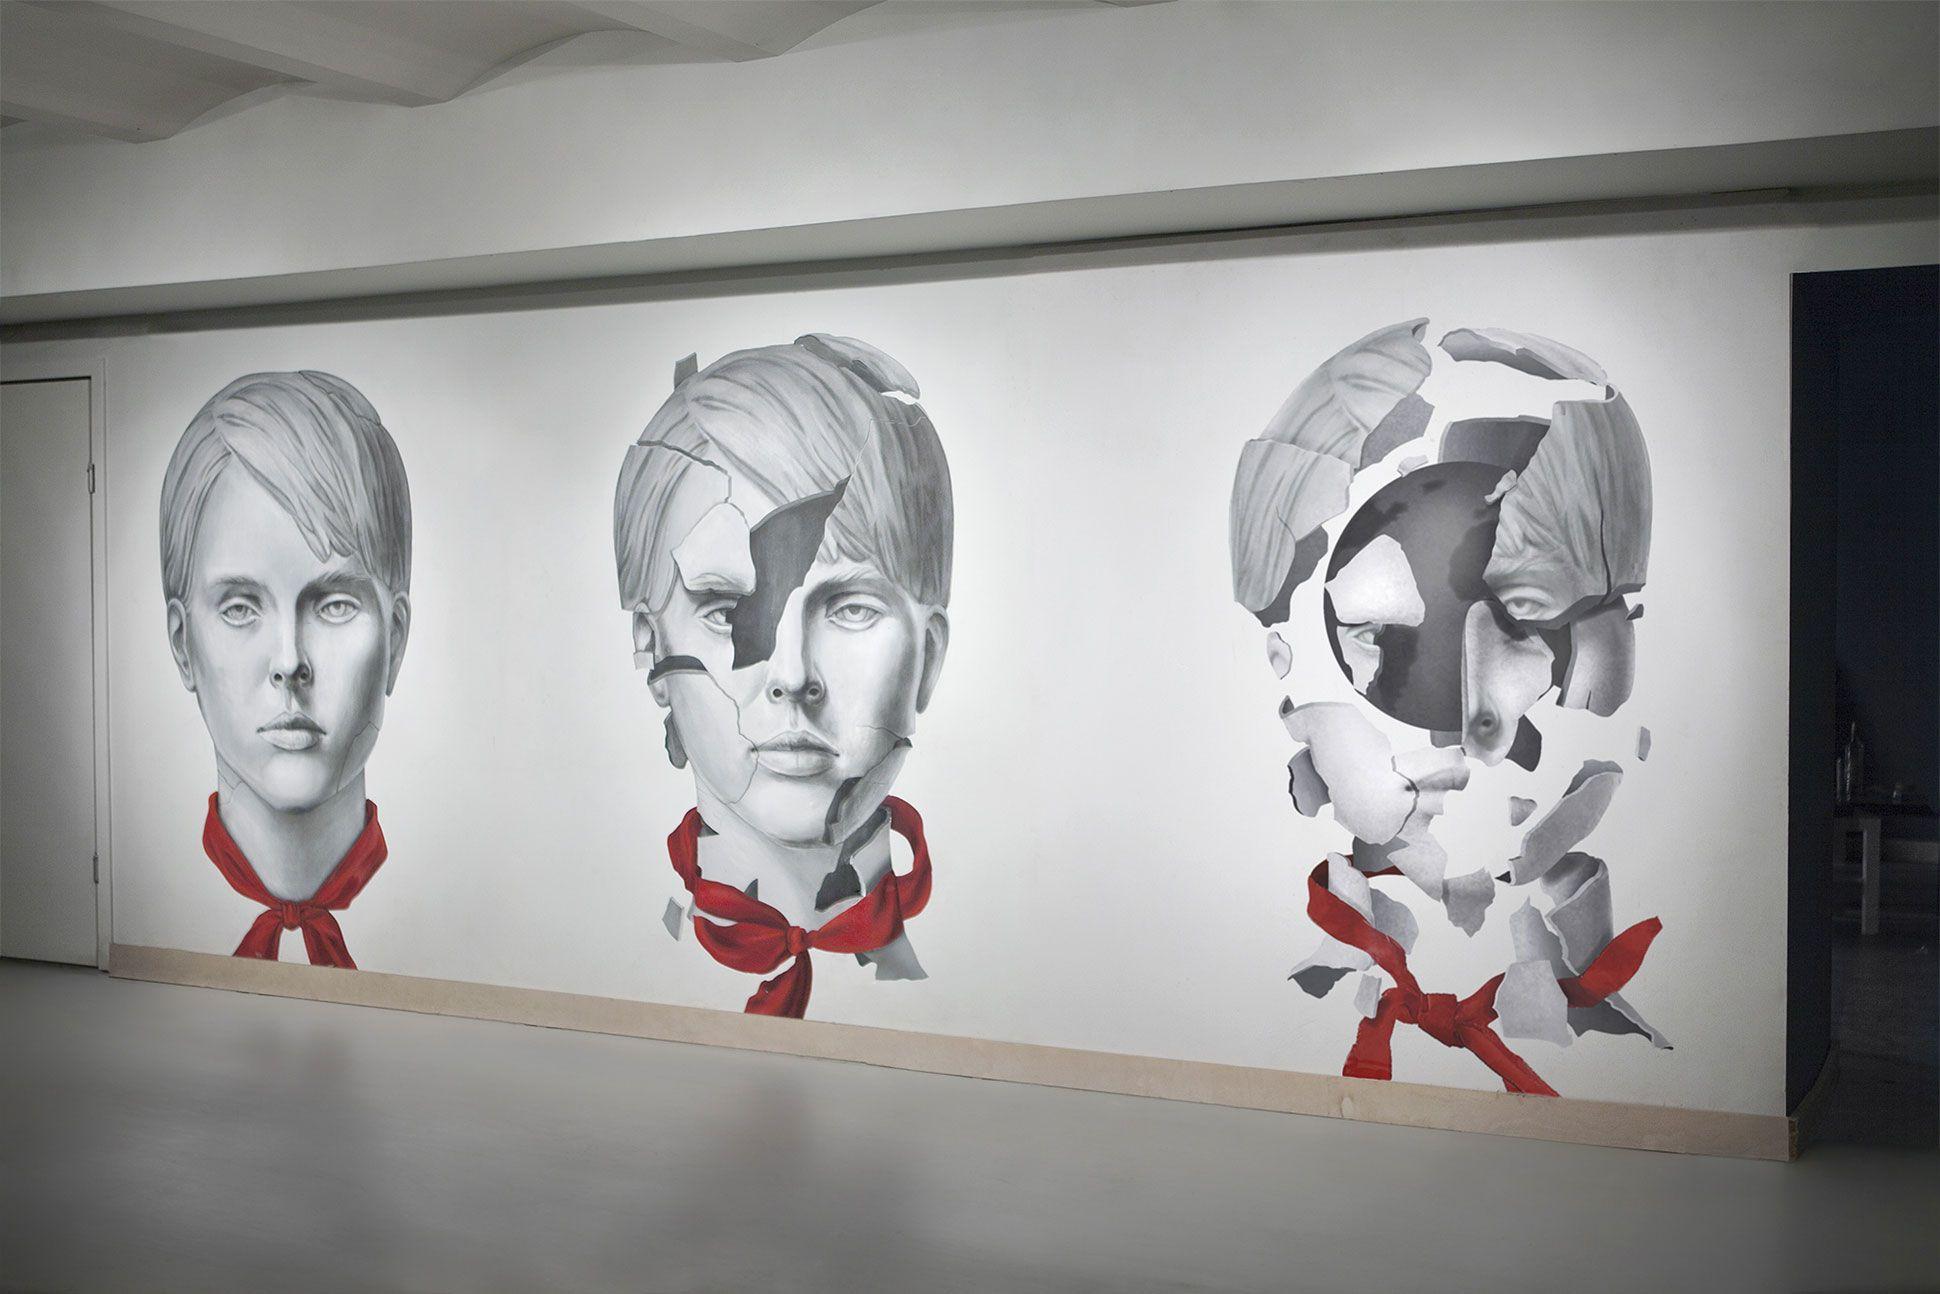 Egor Kraft | Egor Kraft is an interdisciplinary artist living & working in Berlin & London